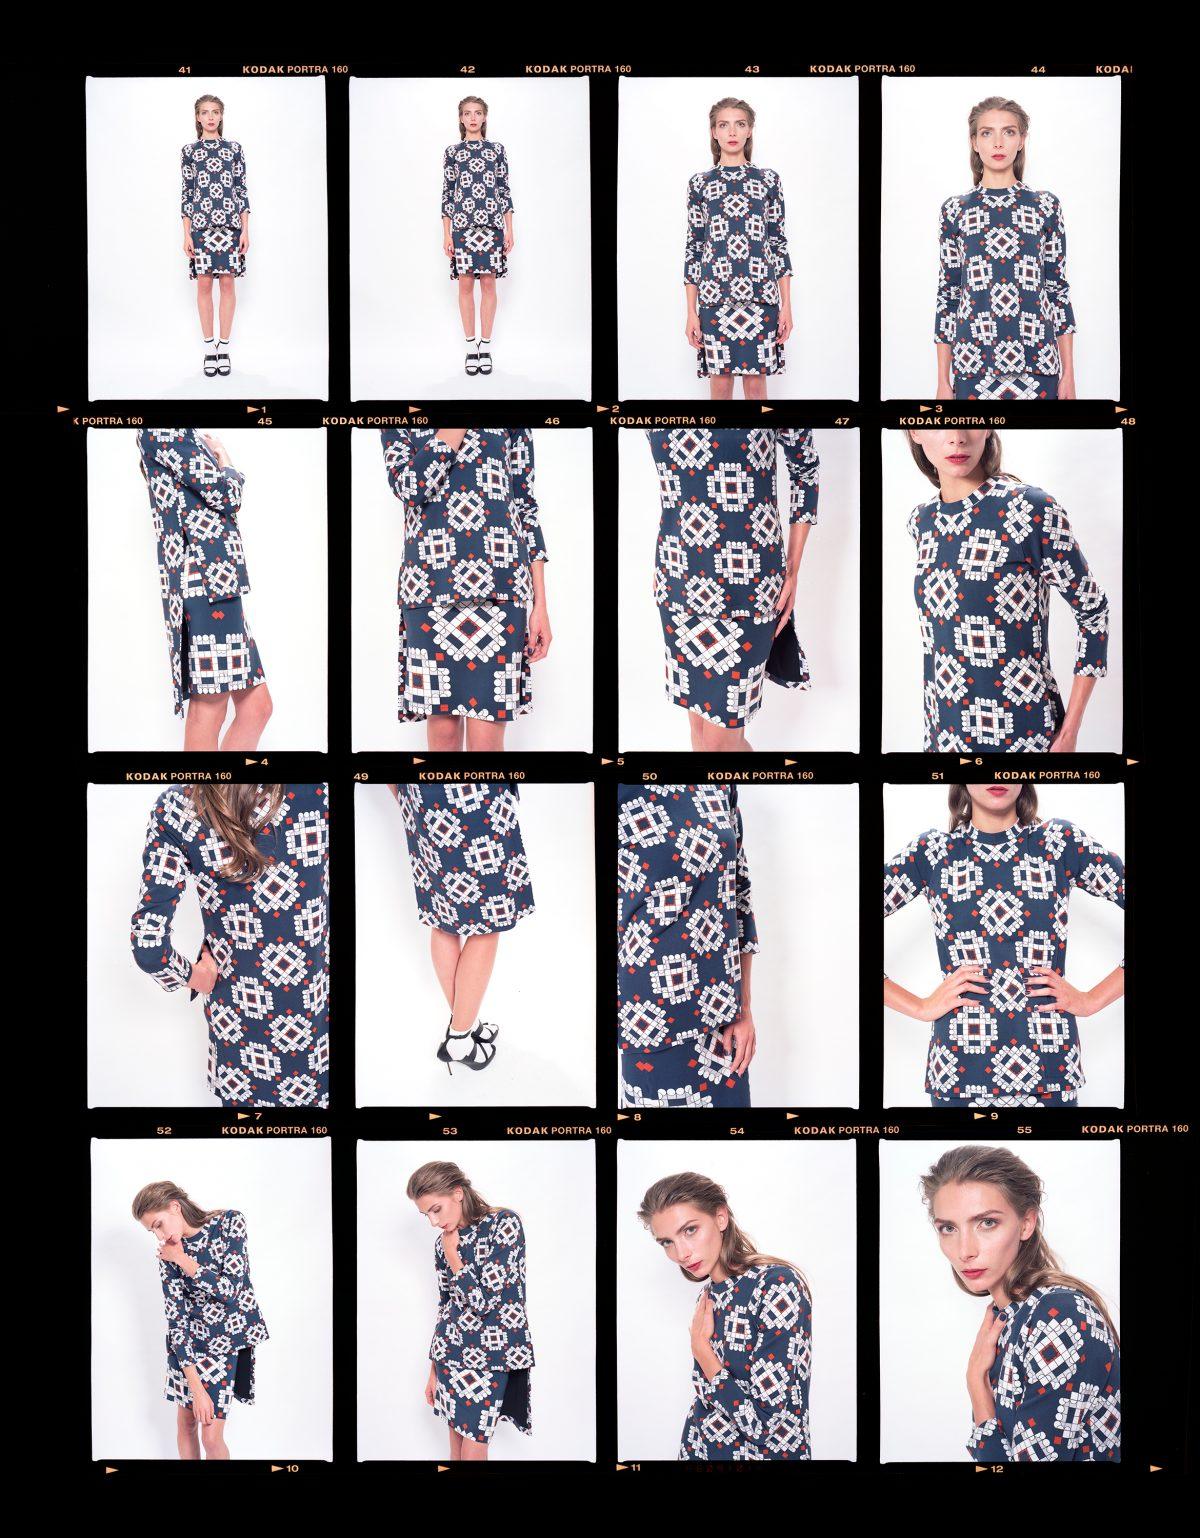 Diametric Circle Long Sleeve T _ Navy + Orange & Diametric Circle Mini Skirt _ Navy + Orange _ Riachi Studio Collection 001